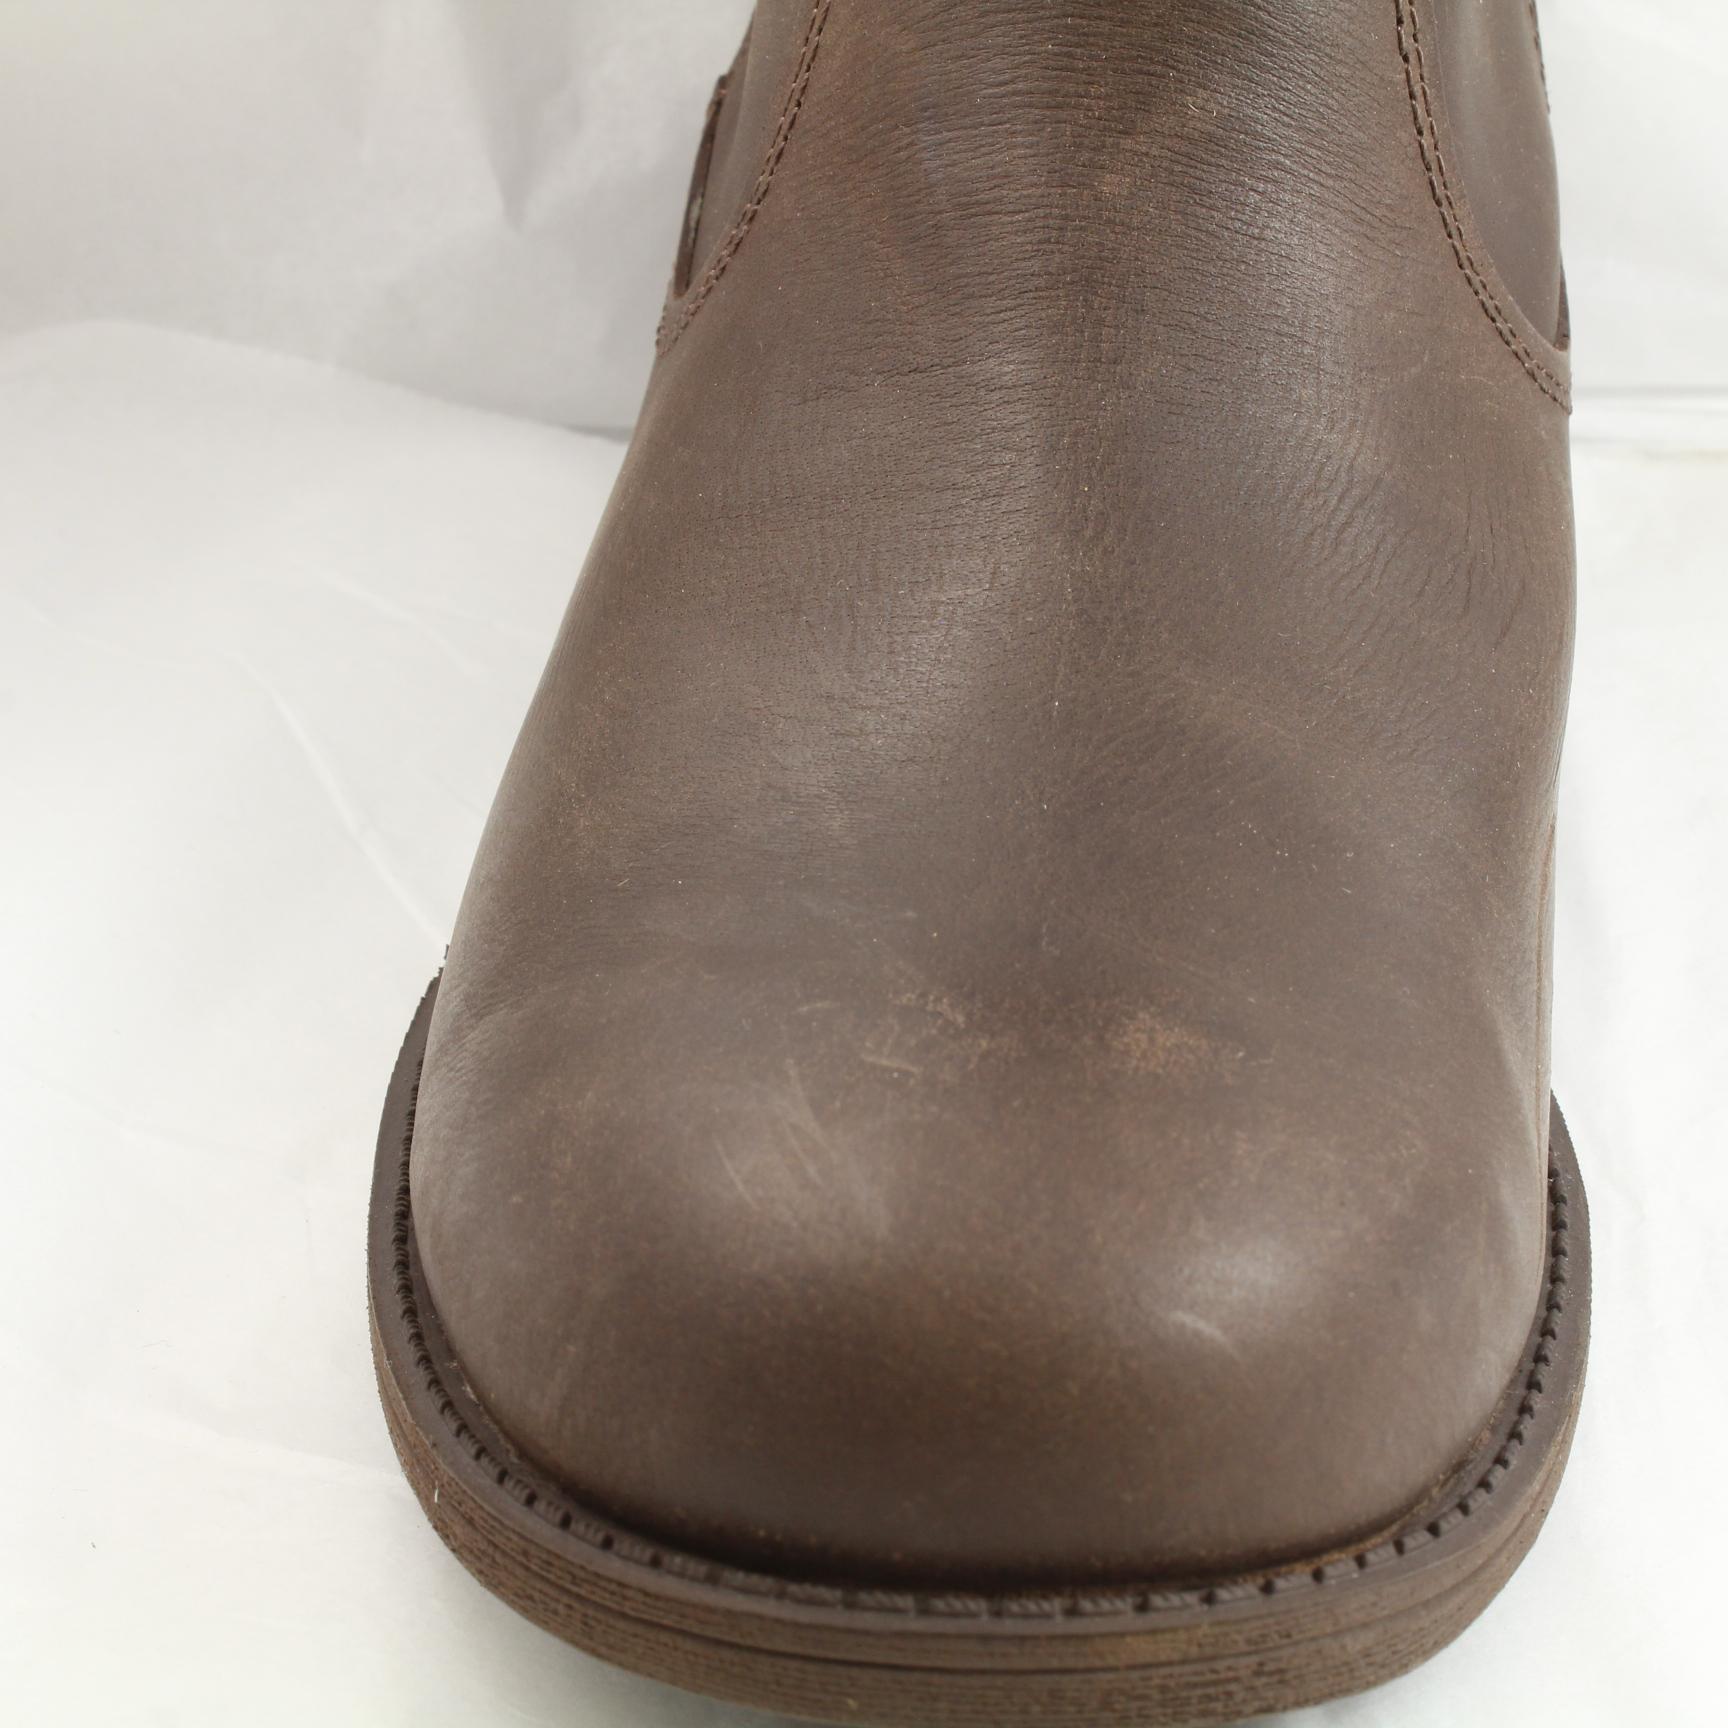 ugg boots size 6 uk